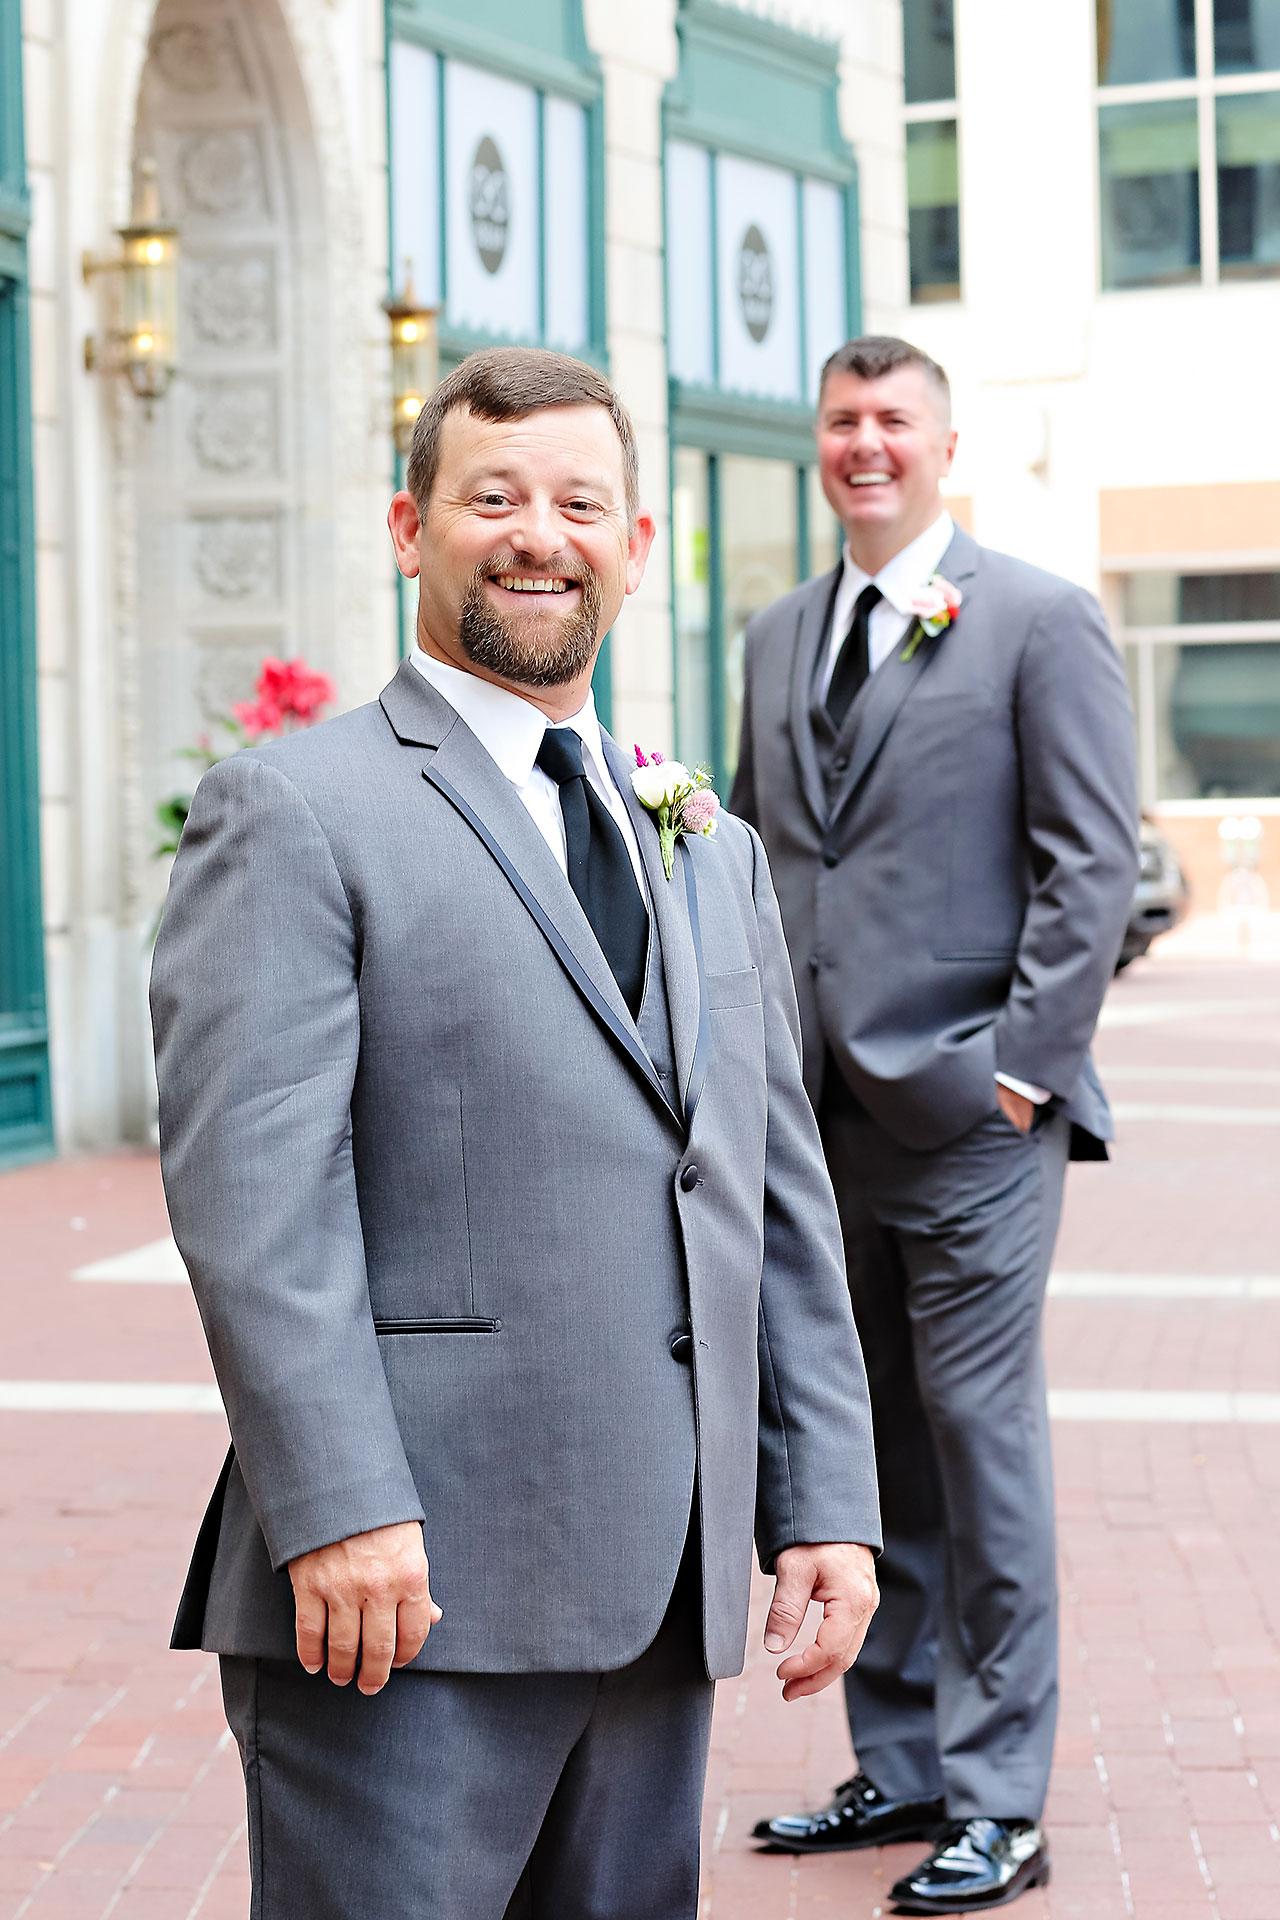 Erin John Artsgarden Indianapolis Wedding 136